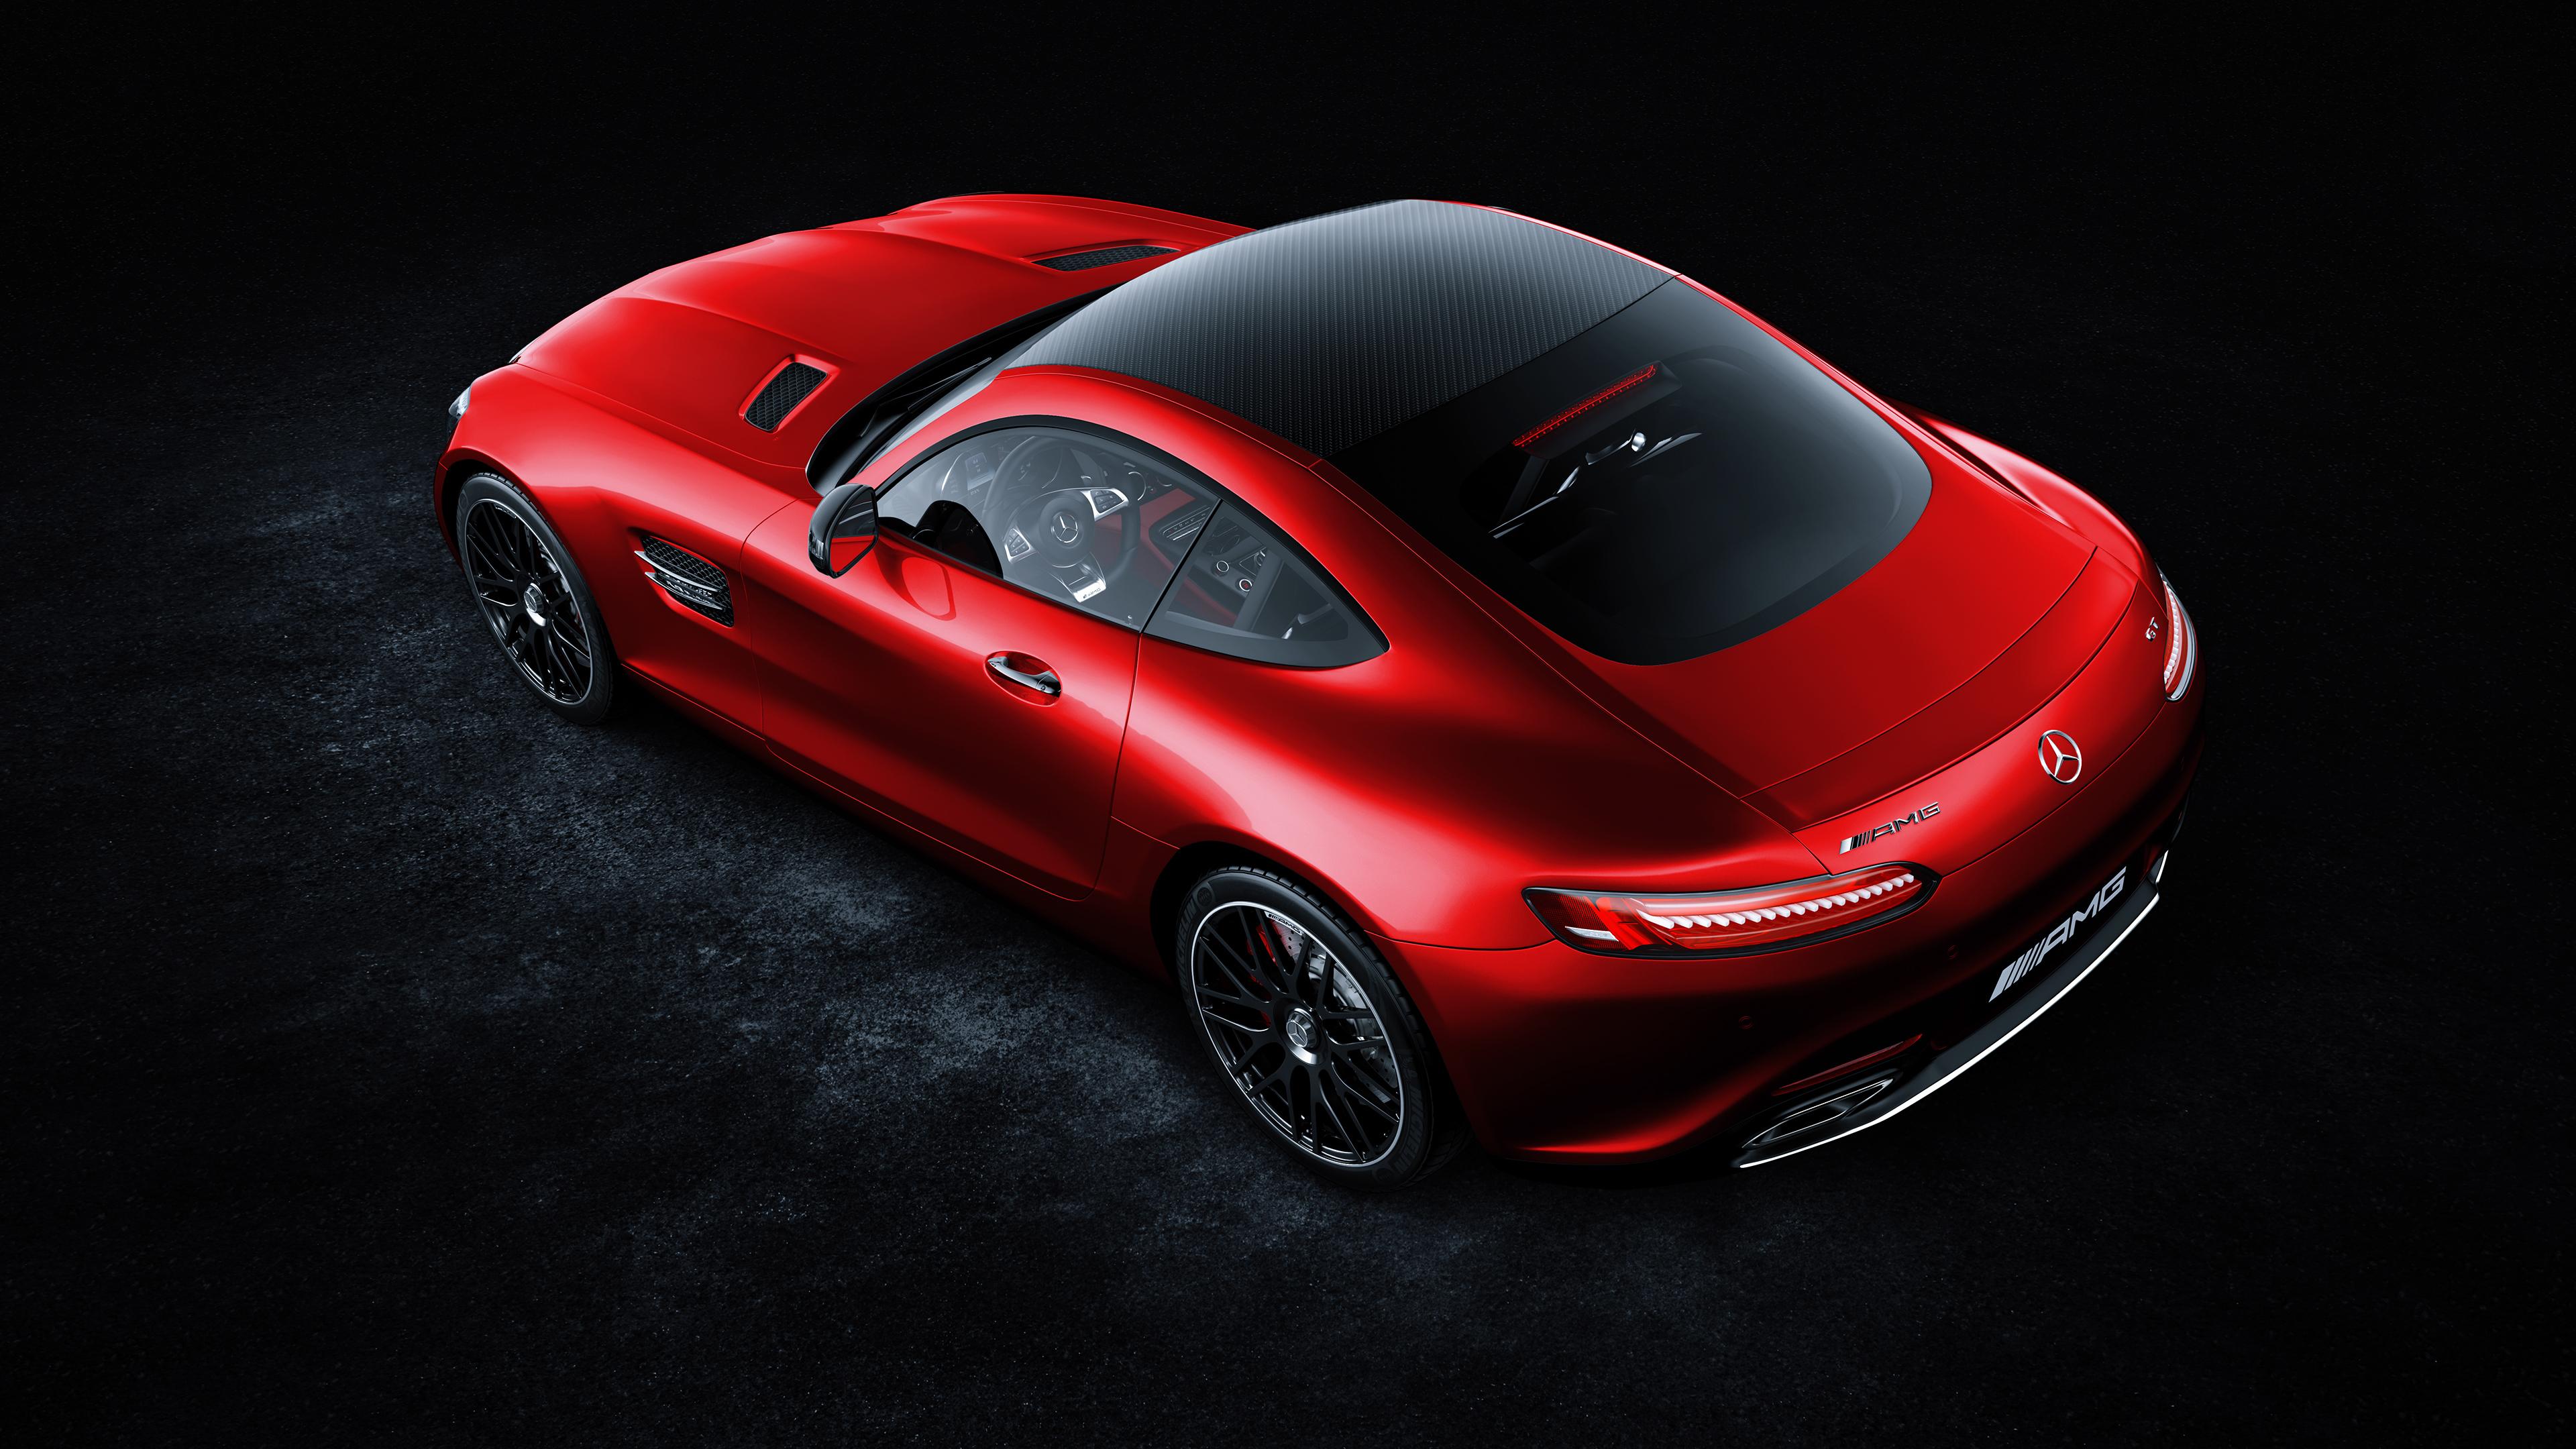 red mercedes benz amg gt 4k 1559764588 - Red Mercedes Benz Amg GT 4k - mercedes wallpapers, mercedes amg gtr wallpapers, hd-wallpapers, cars wallpapers, behance wallpapers